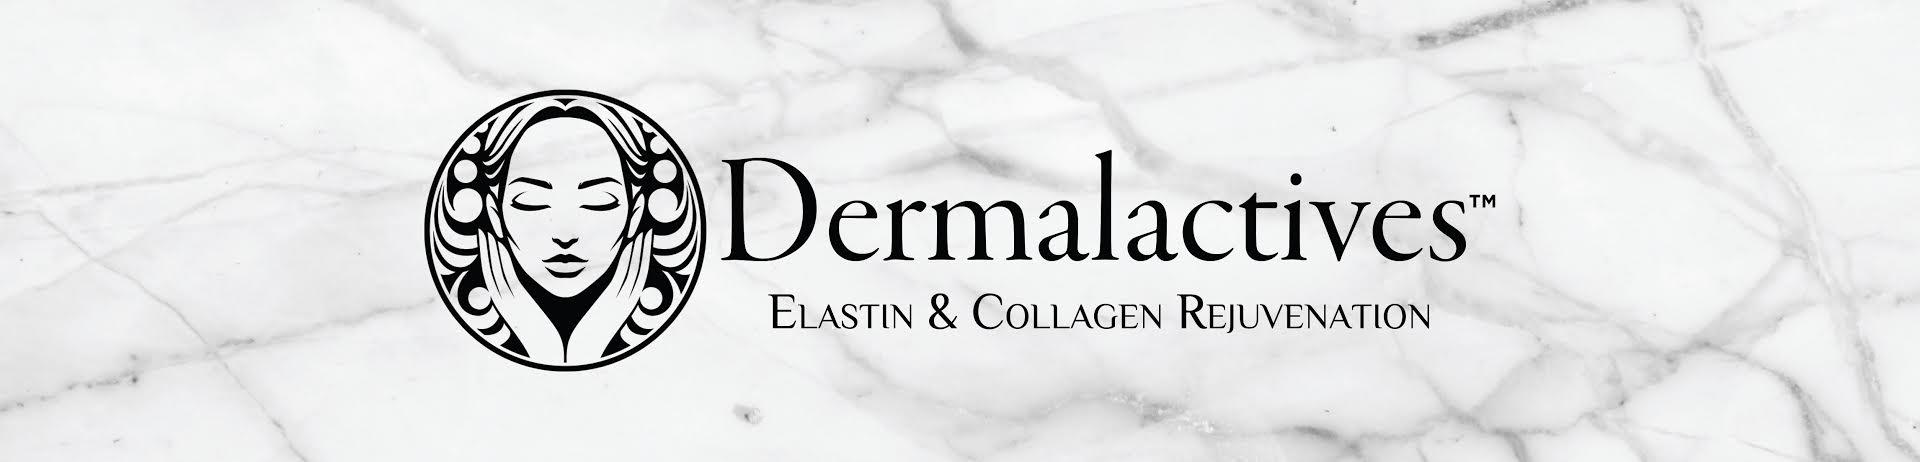 Spa Skincare and Spa Retail-Dermalactives and Spa Advisors Retail Blog Post #4